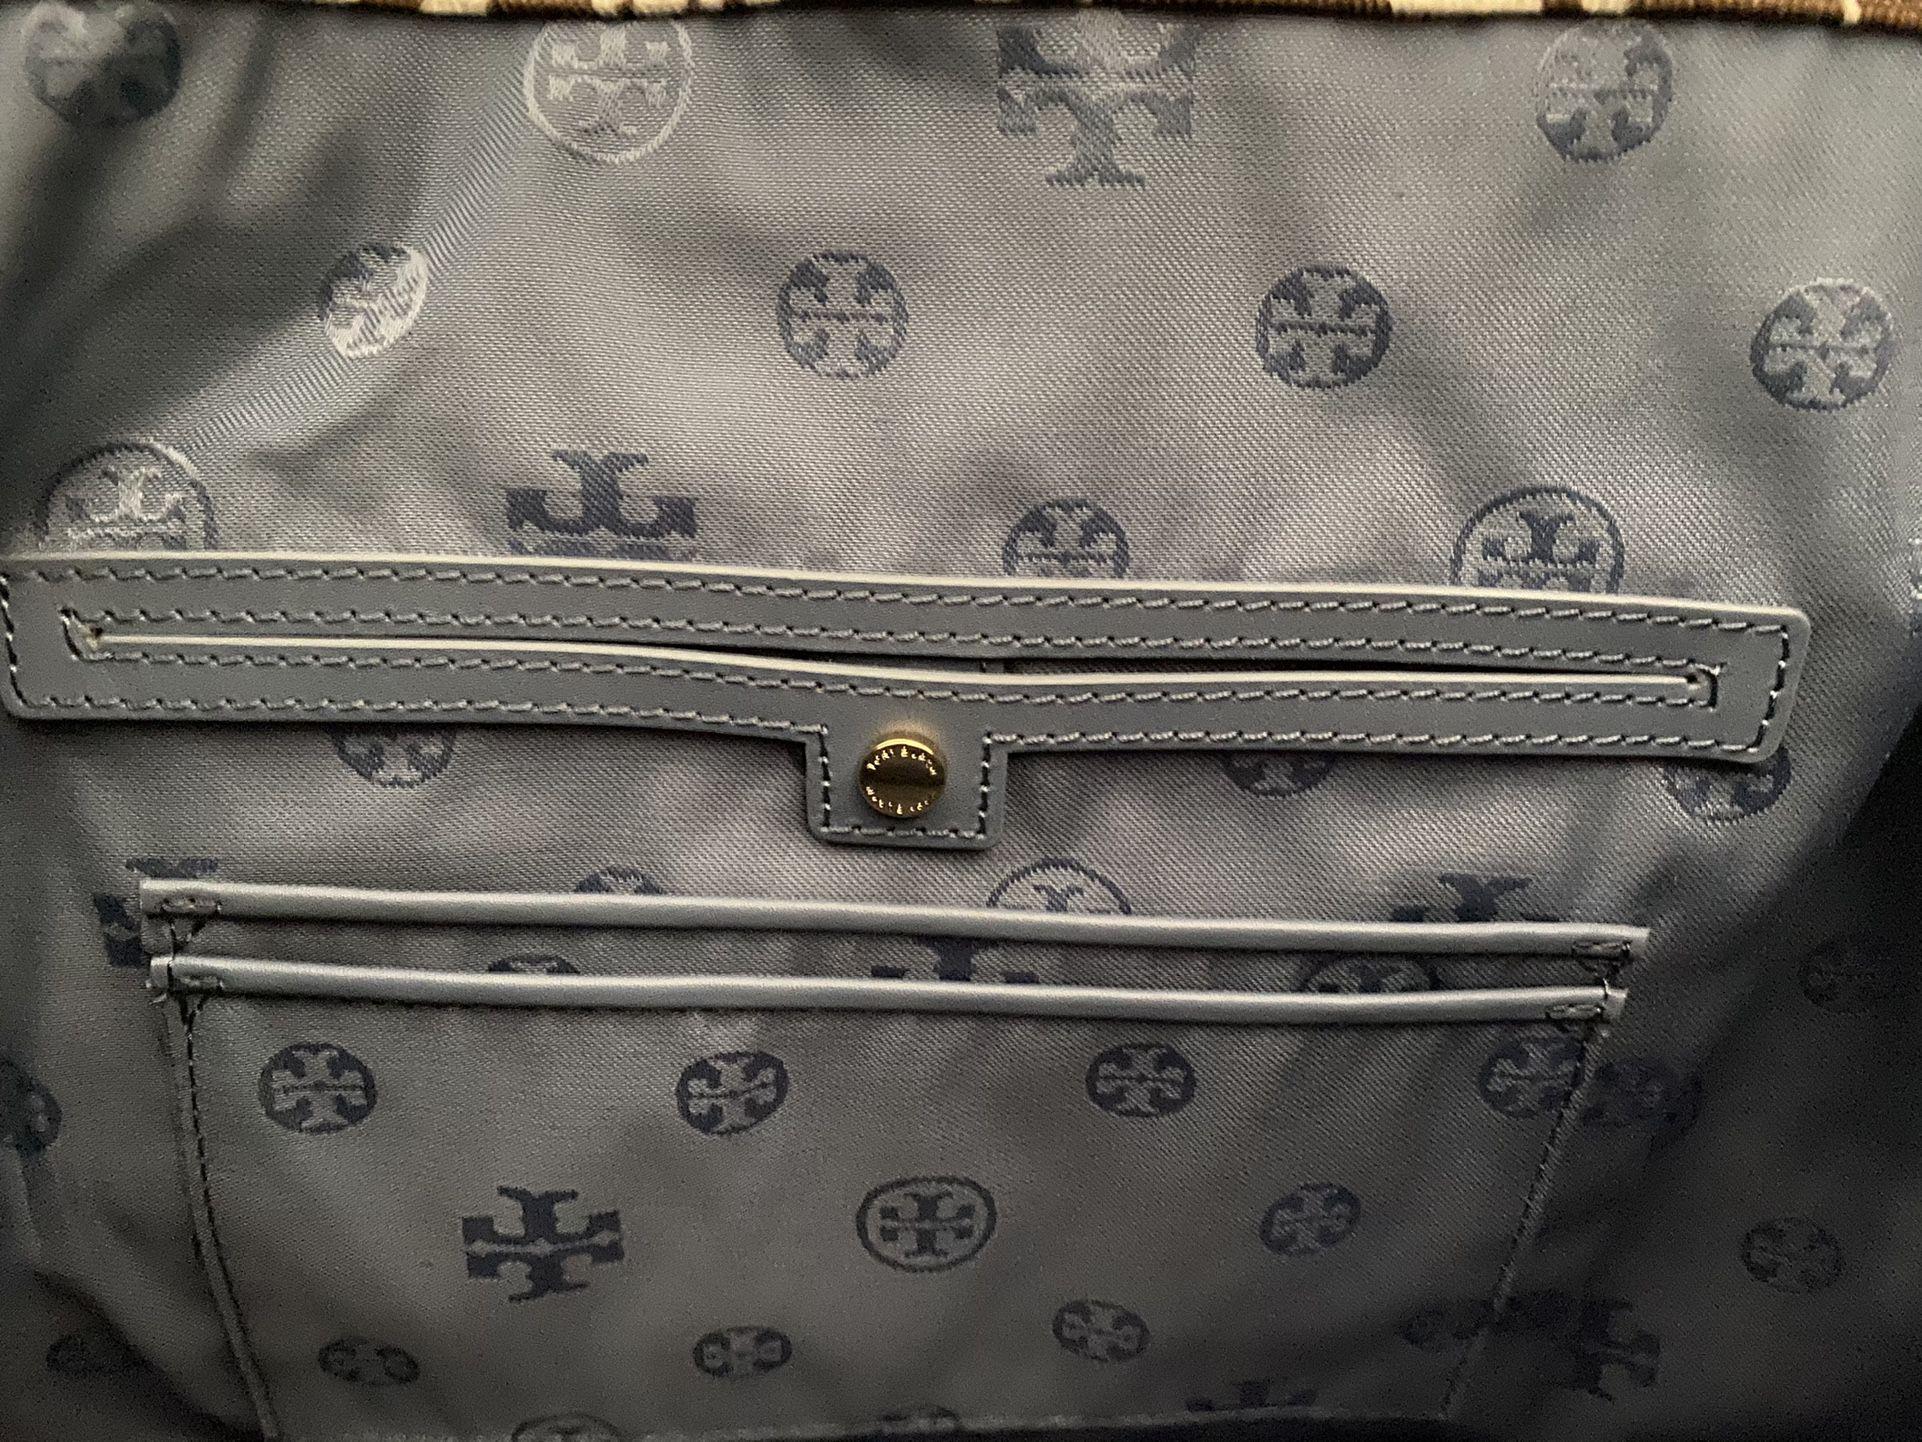 Tory Burch  Large Handbag Brand New